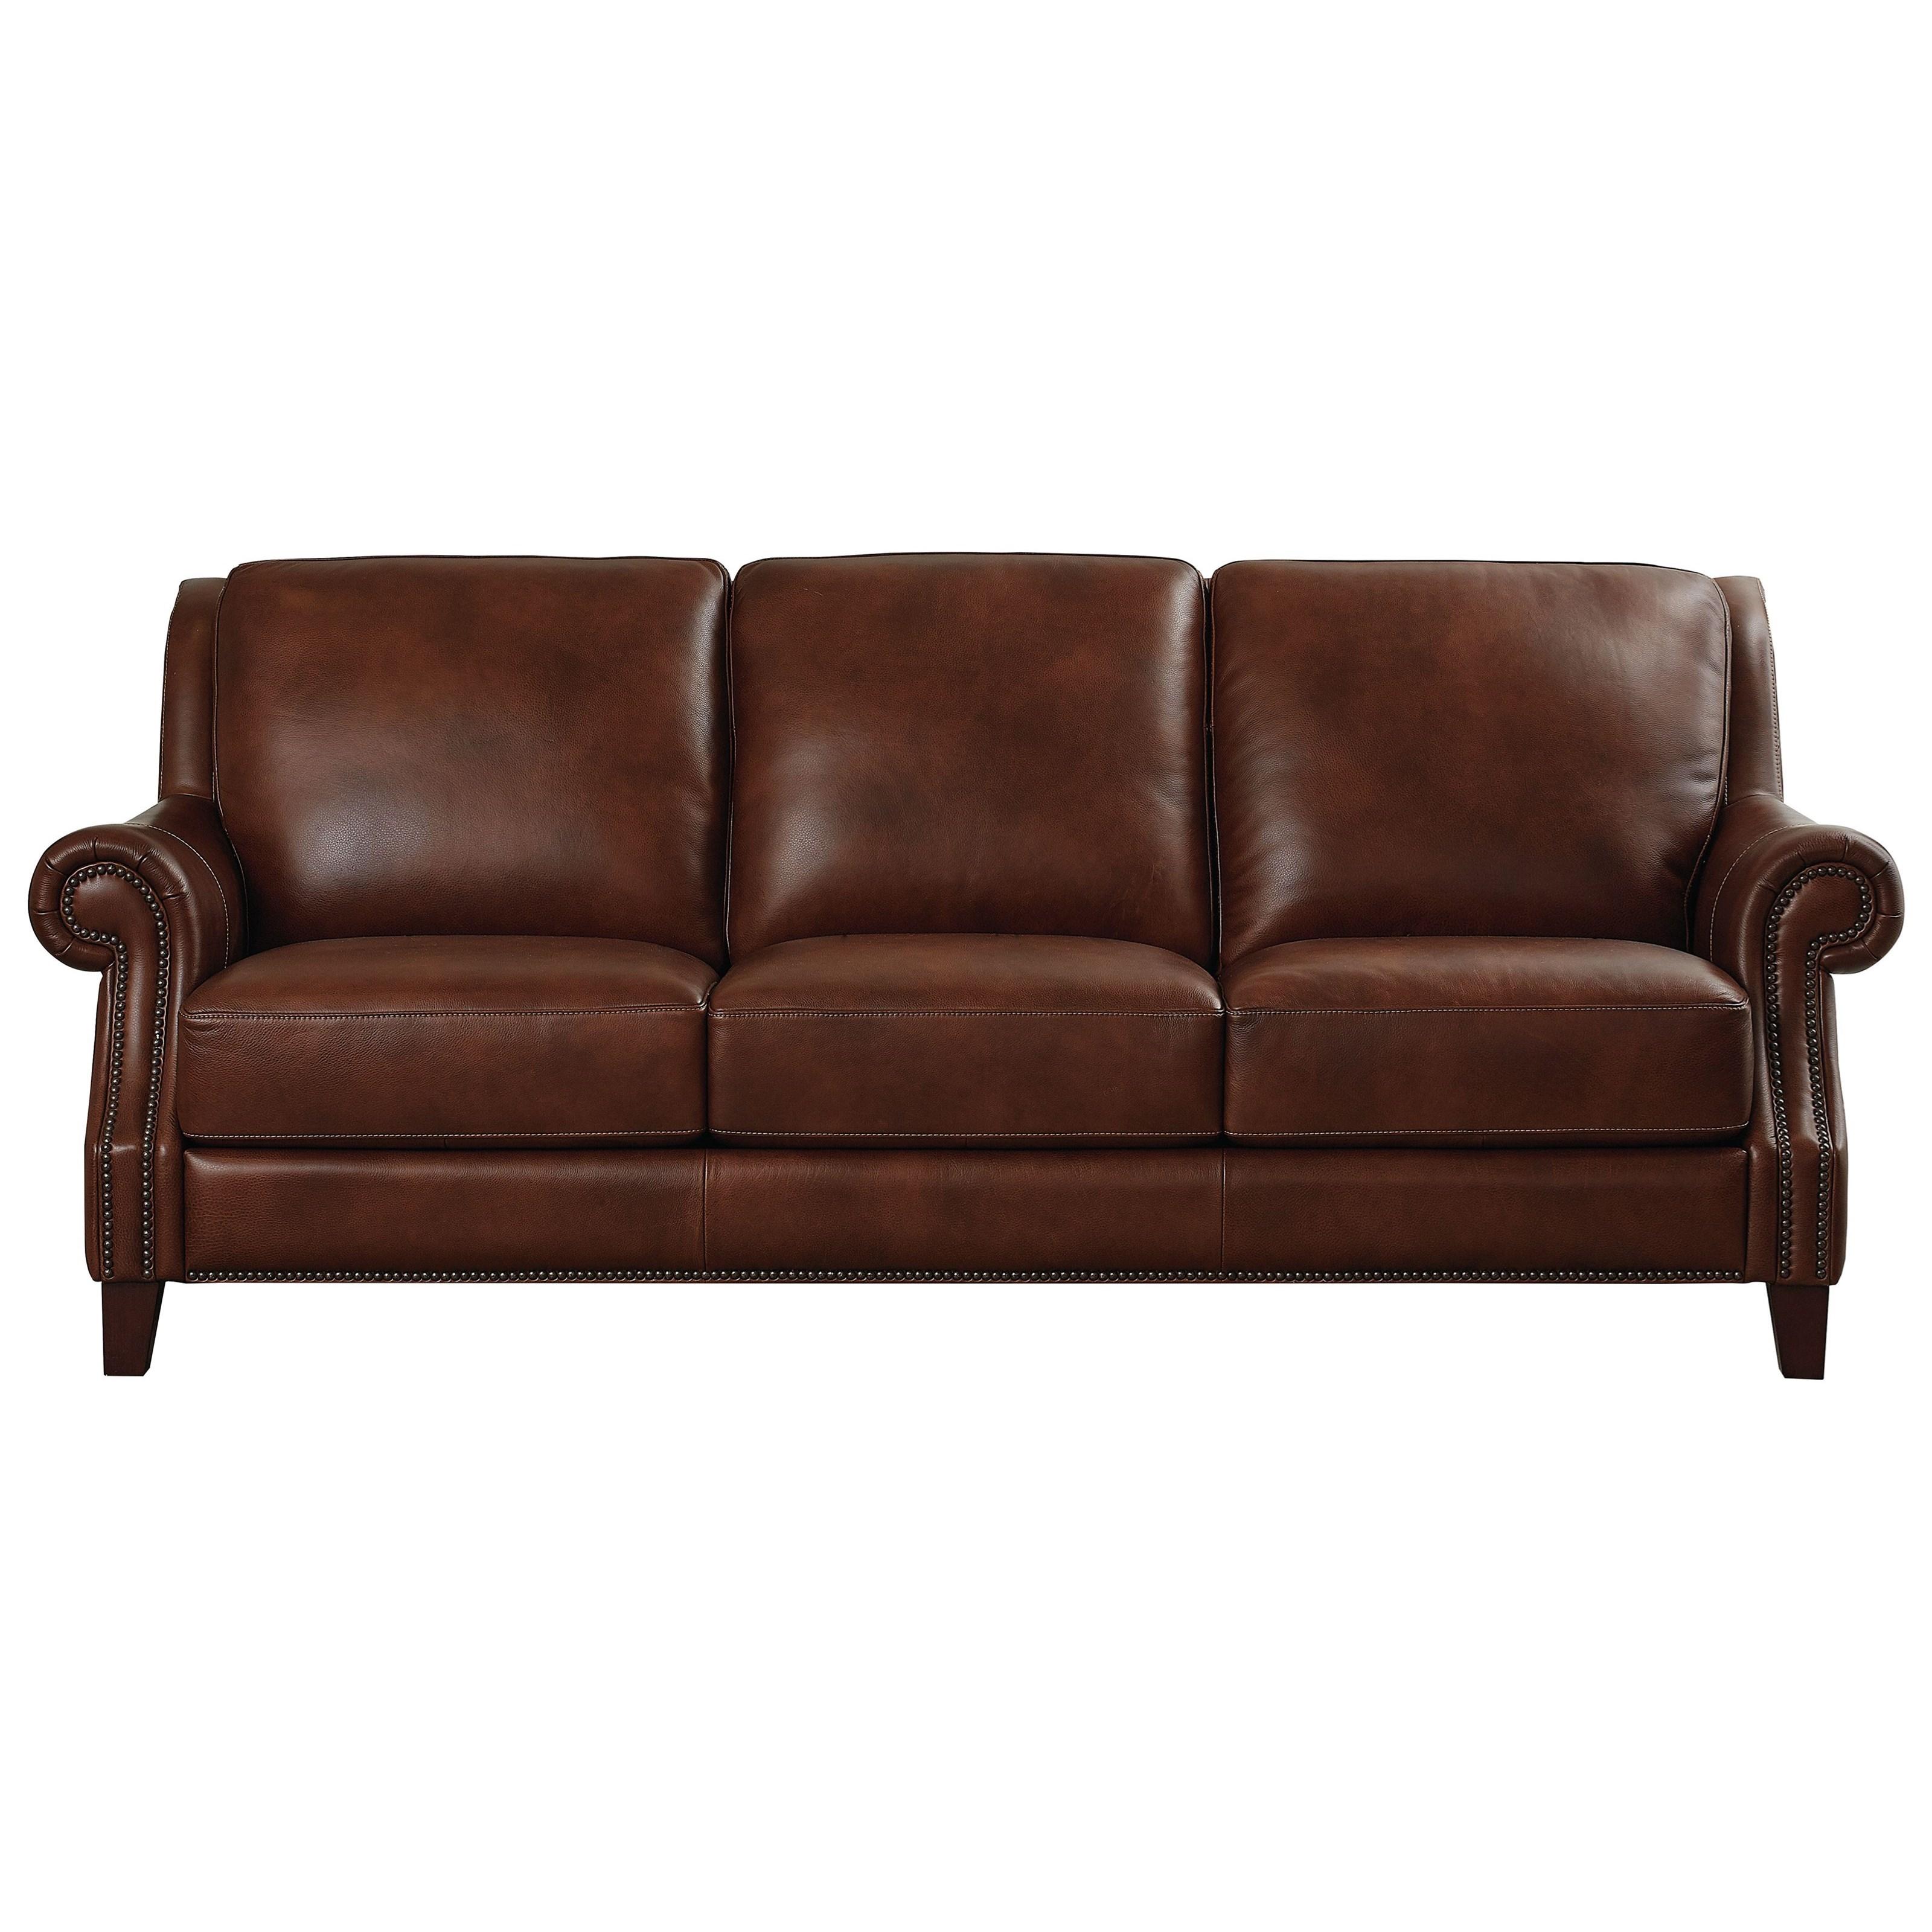 Pierce Sofa by Bassett at Wilcox Furniture